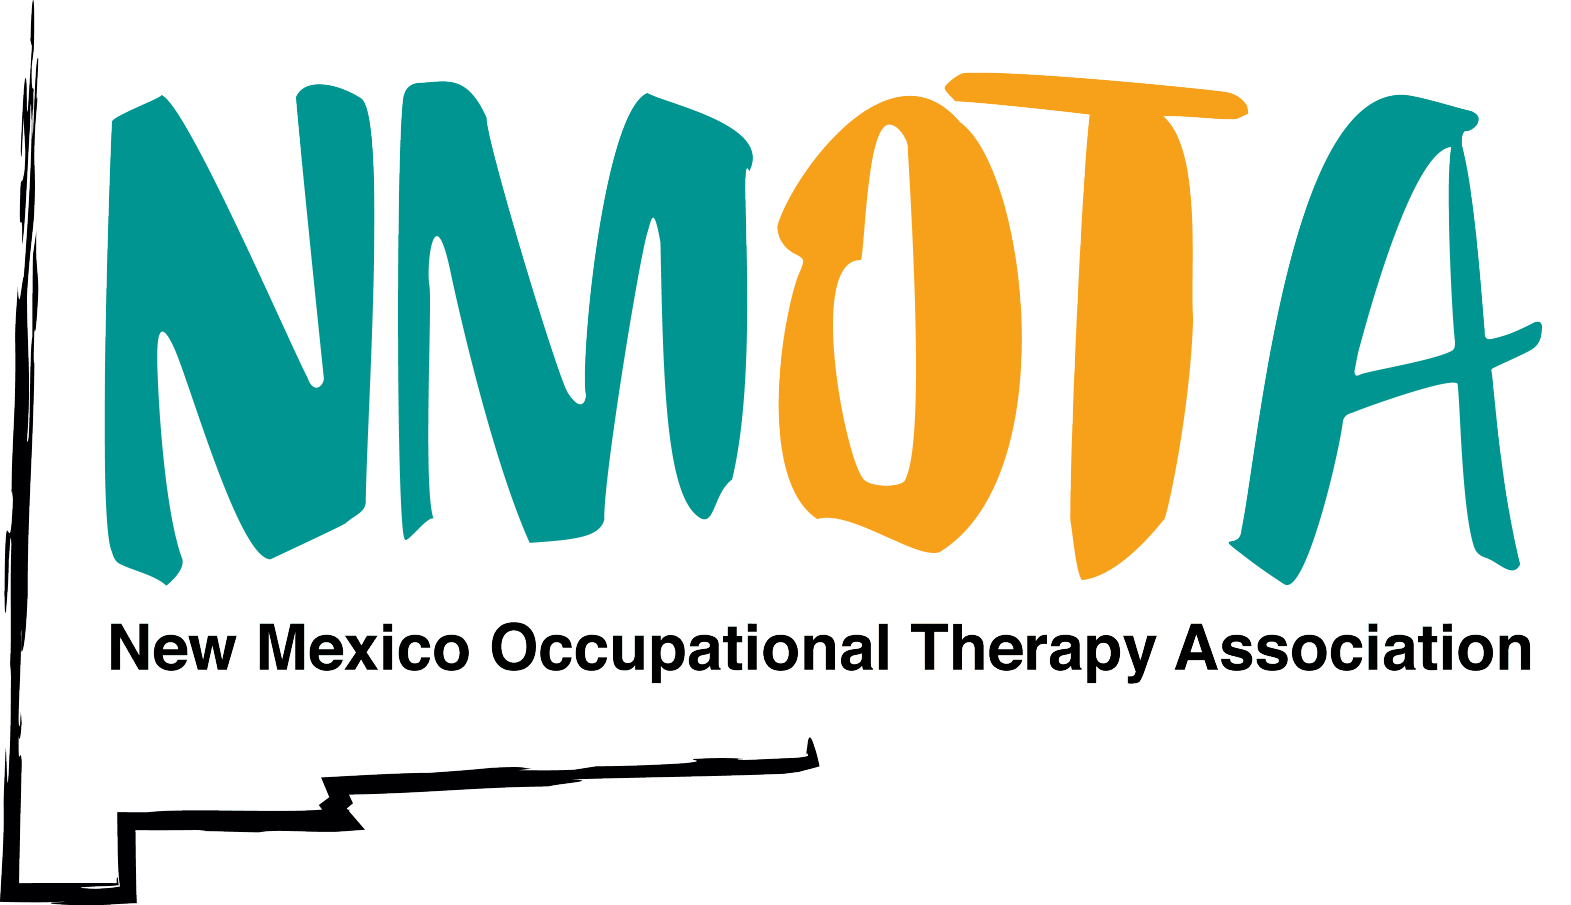 NMOTA